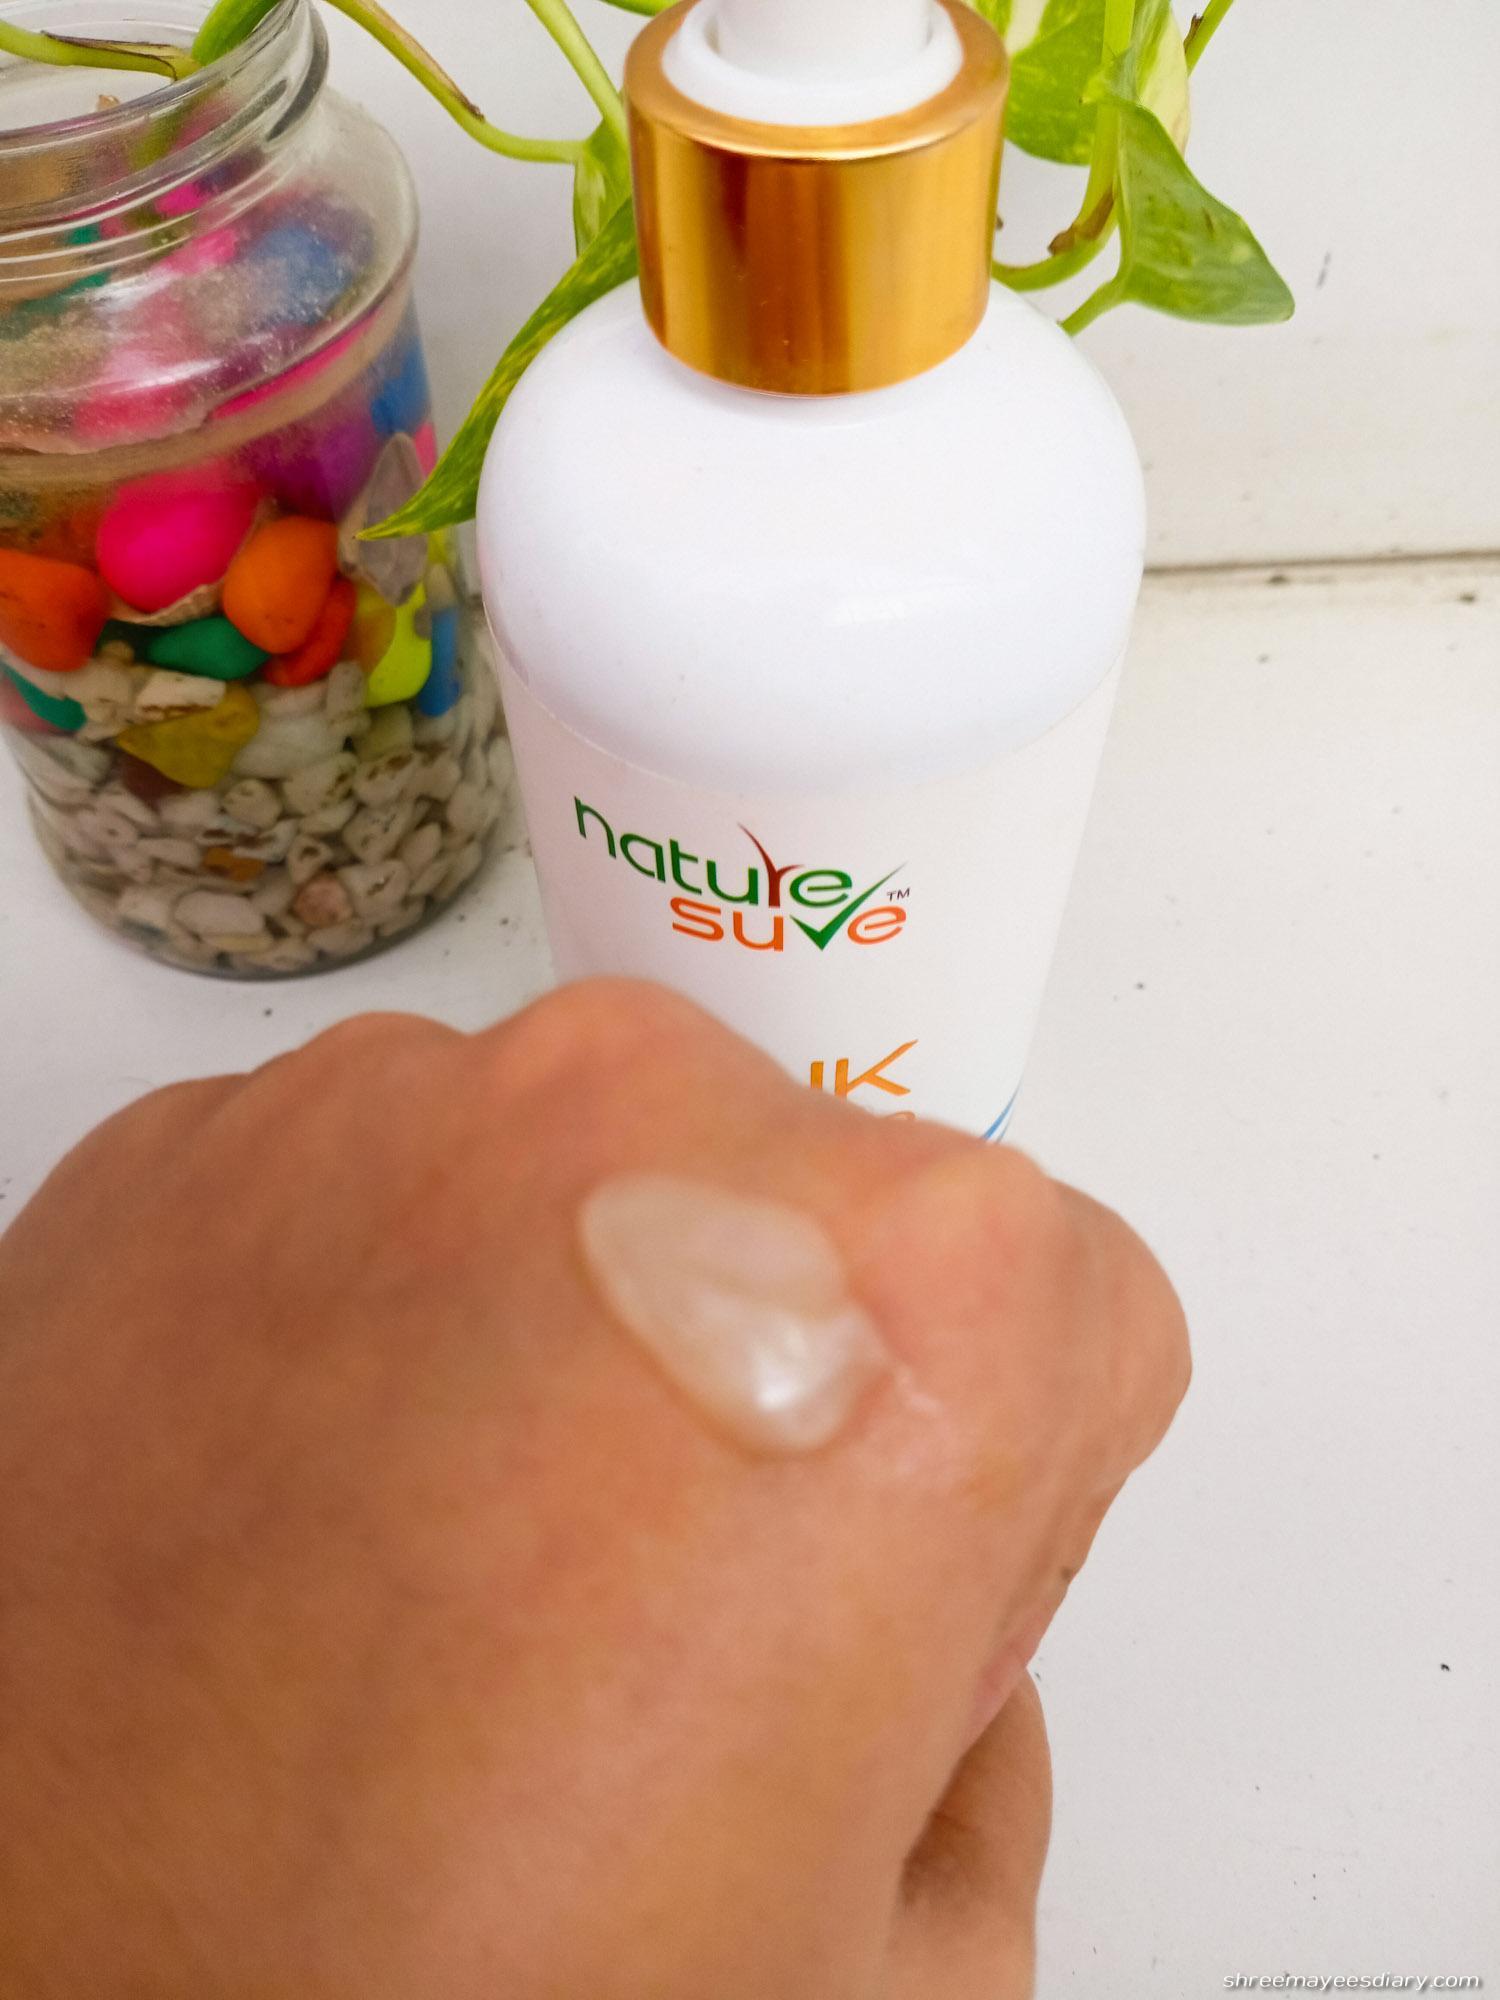 Shampoo, haircare, sulphate-free, anti-hairfall,